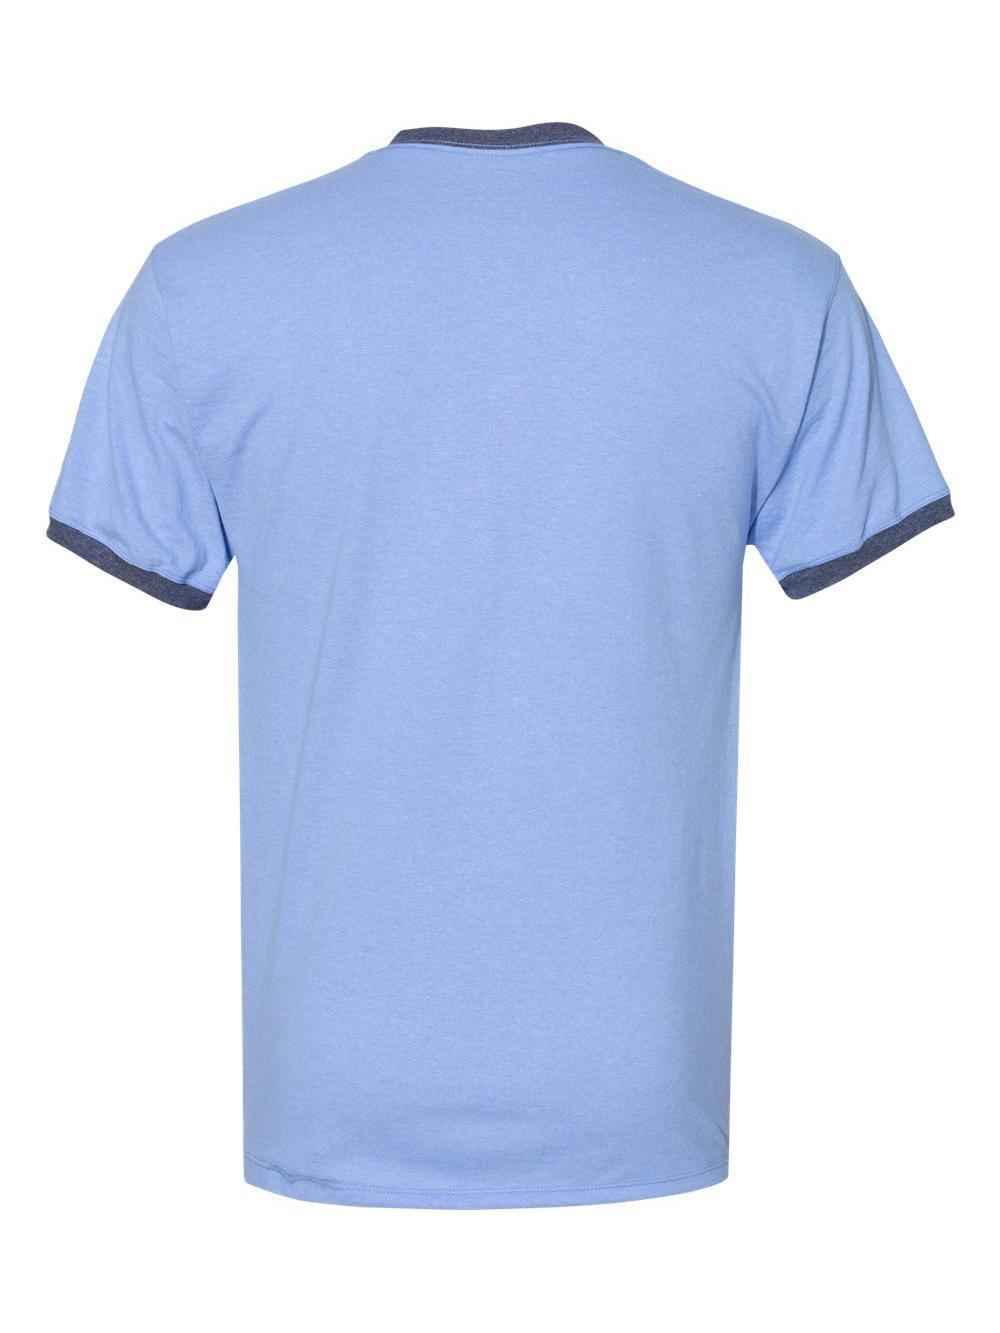 Champion-Premium-Fashion-Ringer-T-Shirt-CP65 thumbnail 15